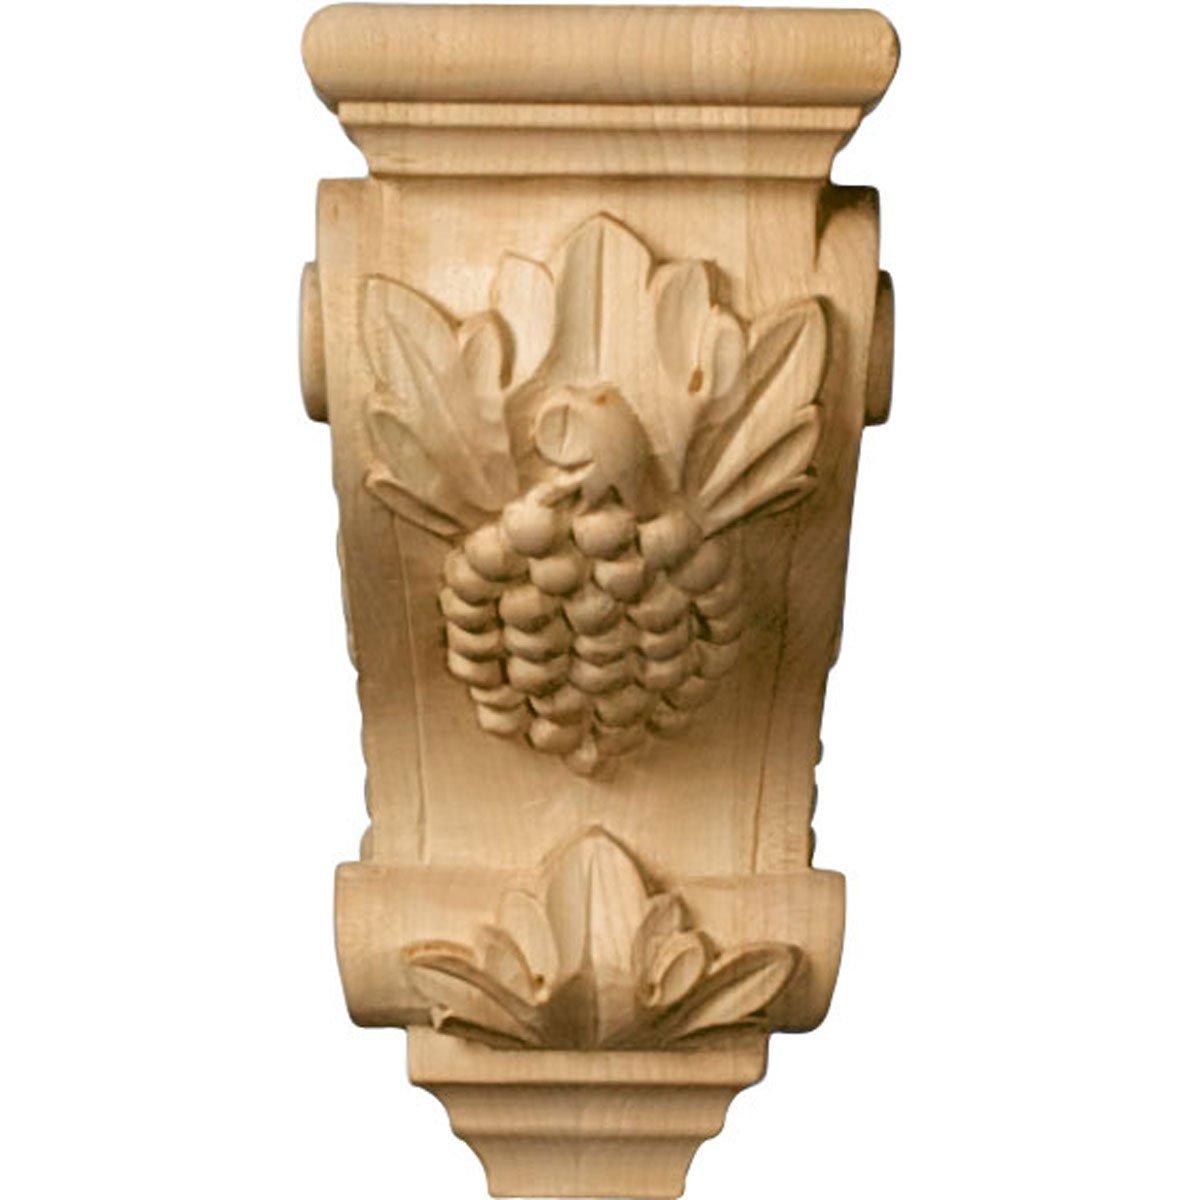 Ekena Millwork CORW03X04X07GRMA 3 1//2-Inch W x 4-Inch D x 7-Inch H Small Grape Corbel Hard Maple